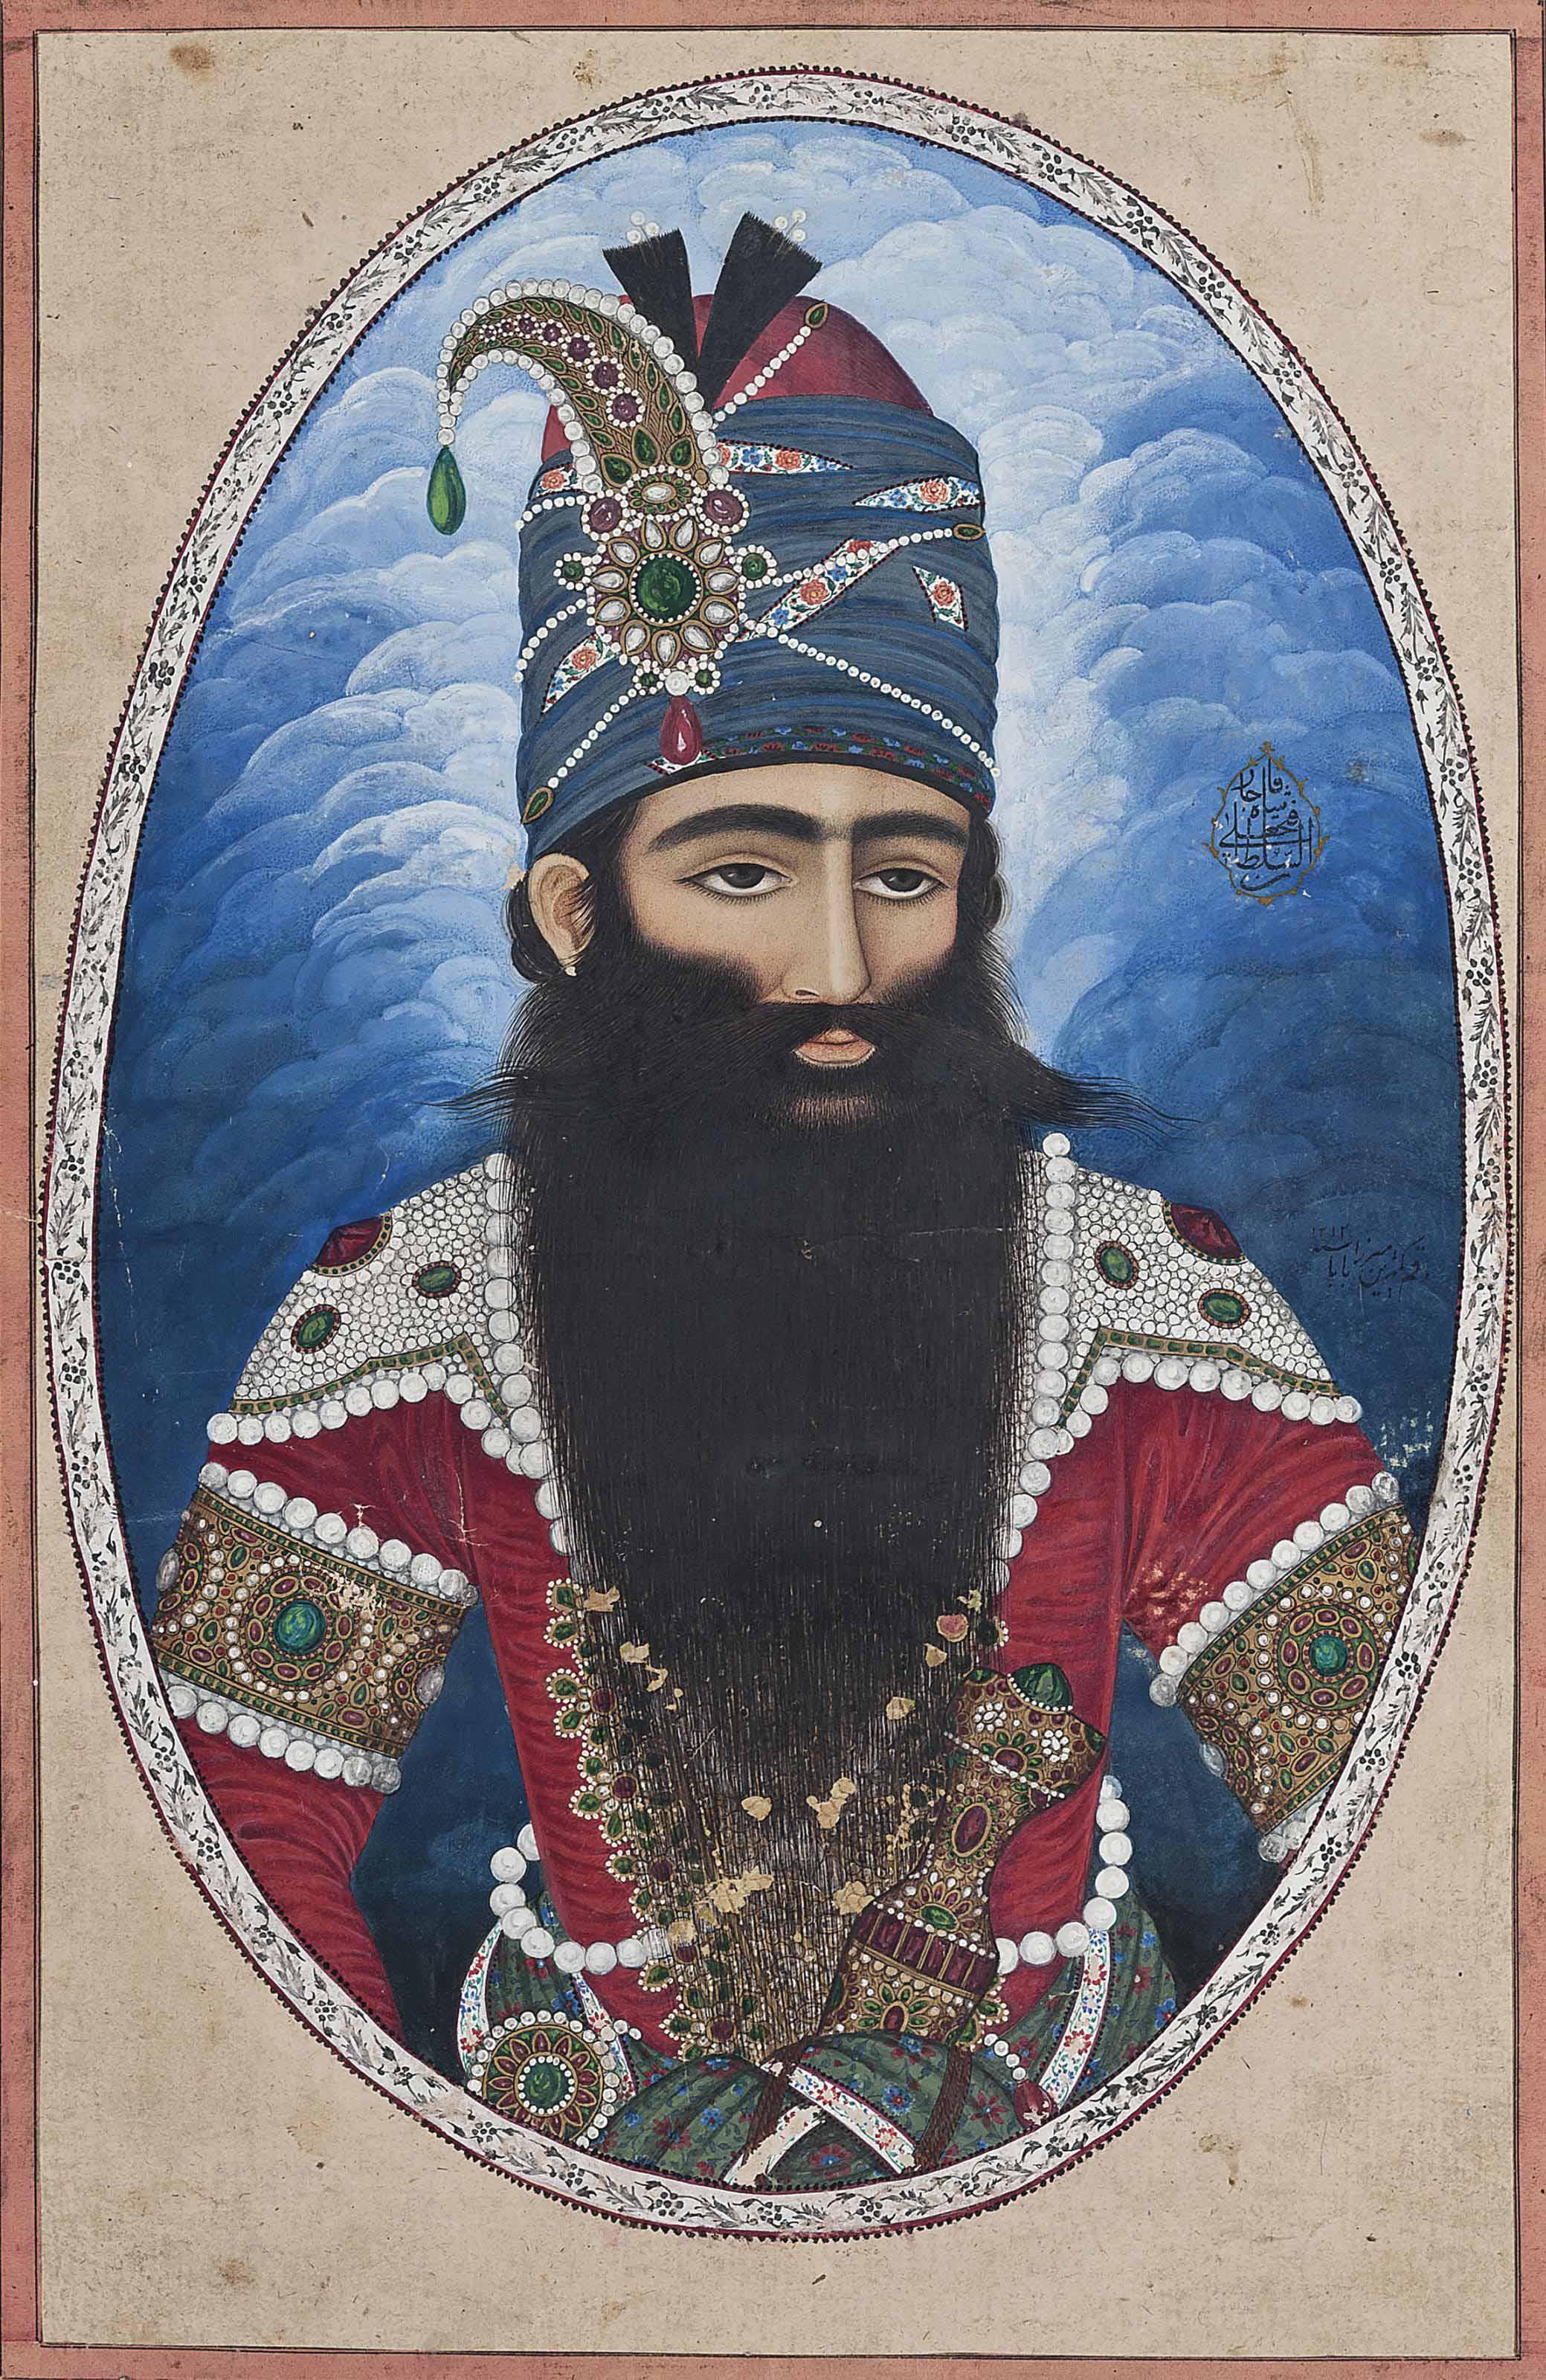 A PORTRAIT OF FATH'ALI SHAH